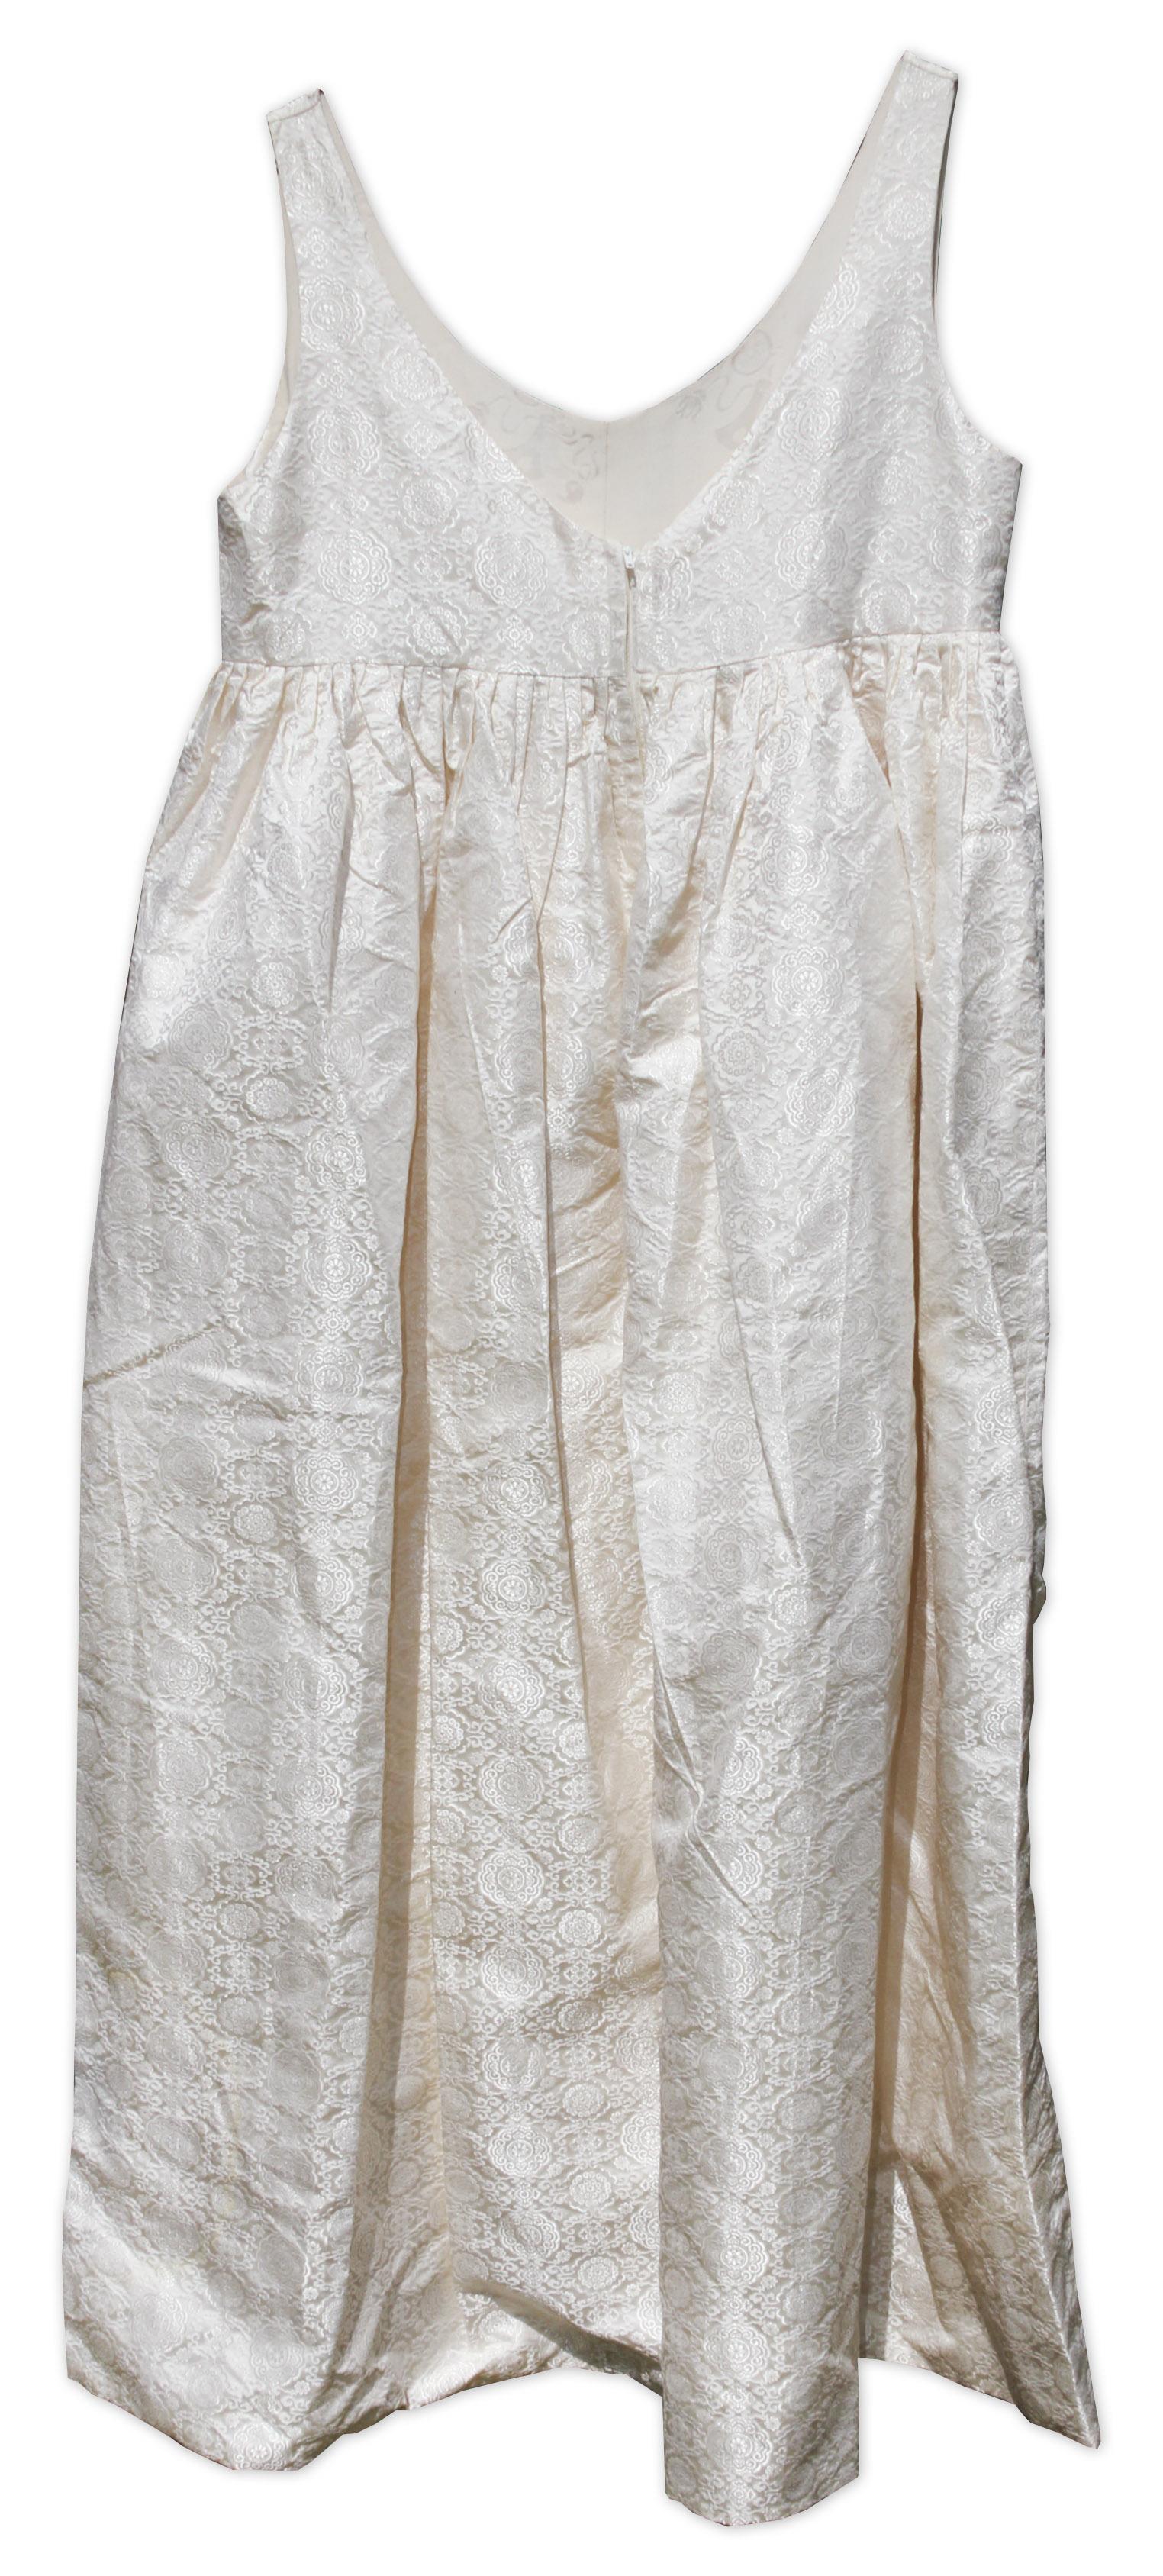 Jacqueline maternity maxi dress